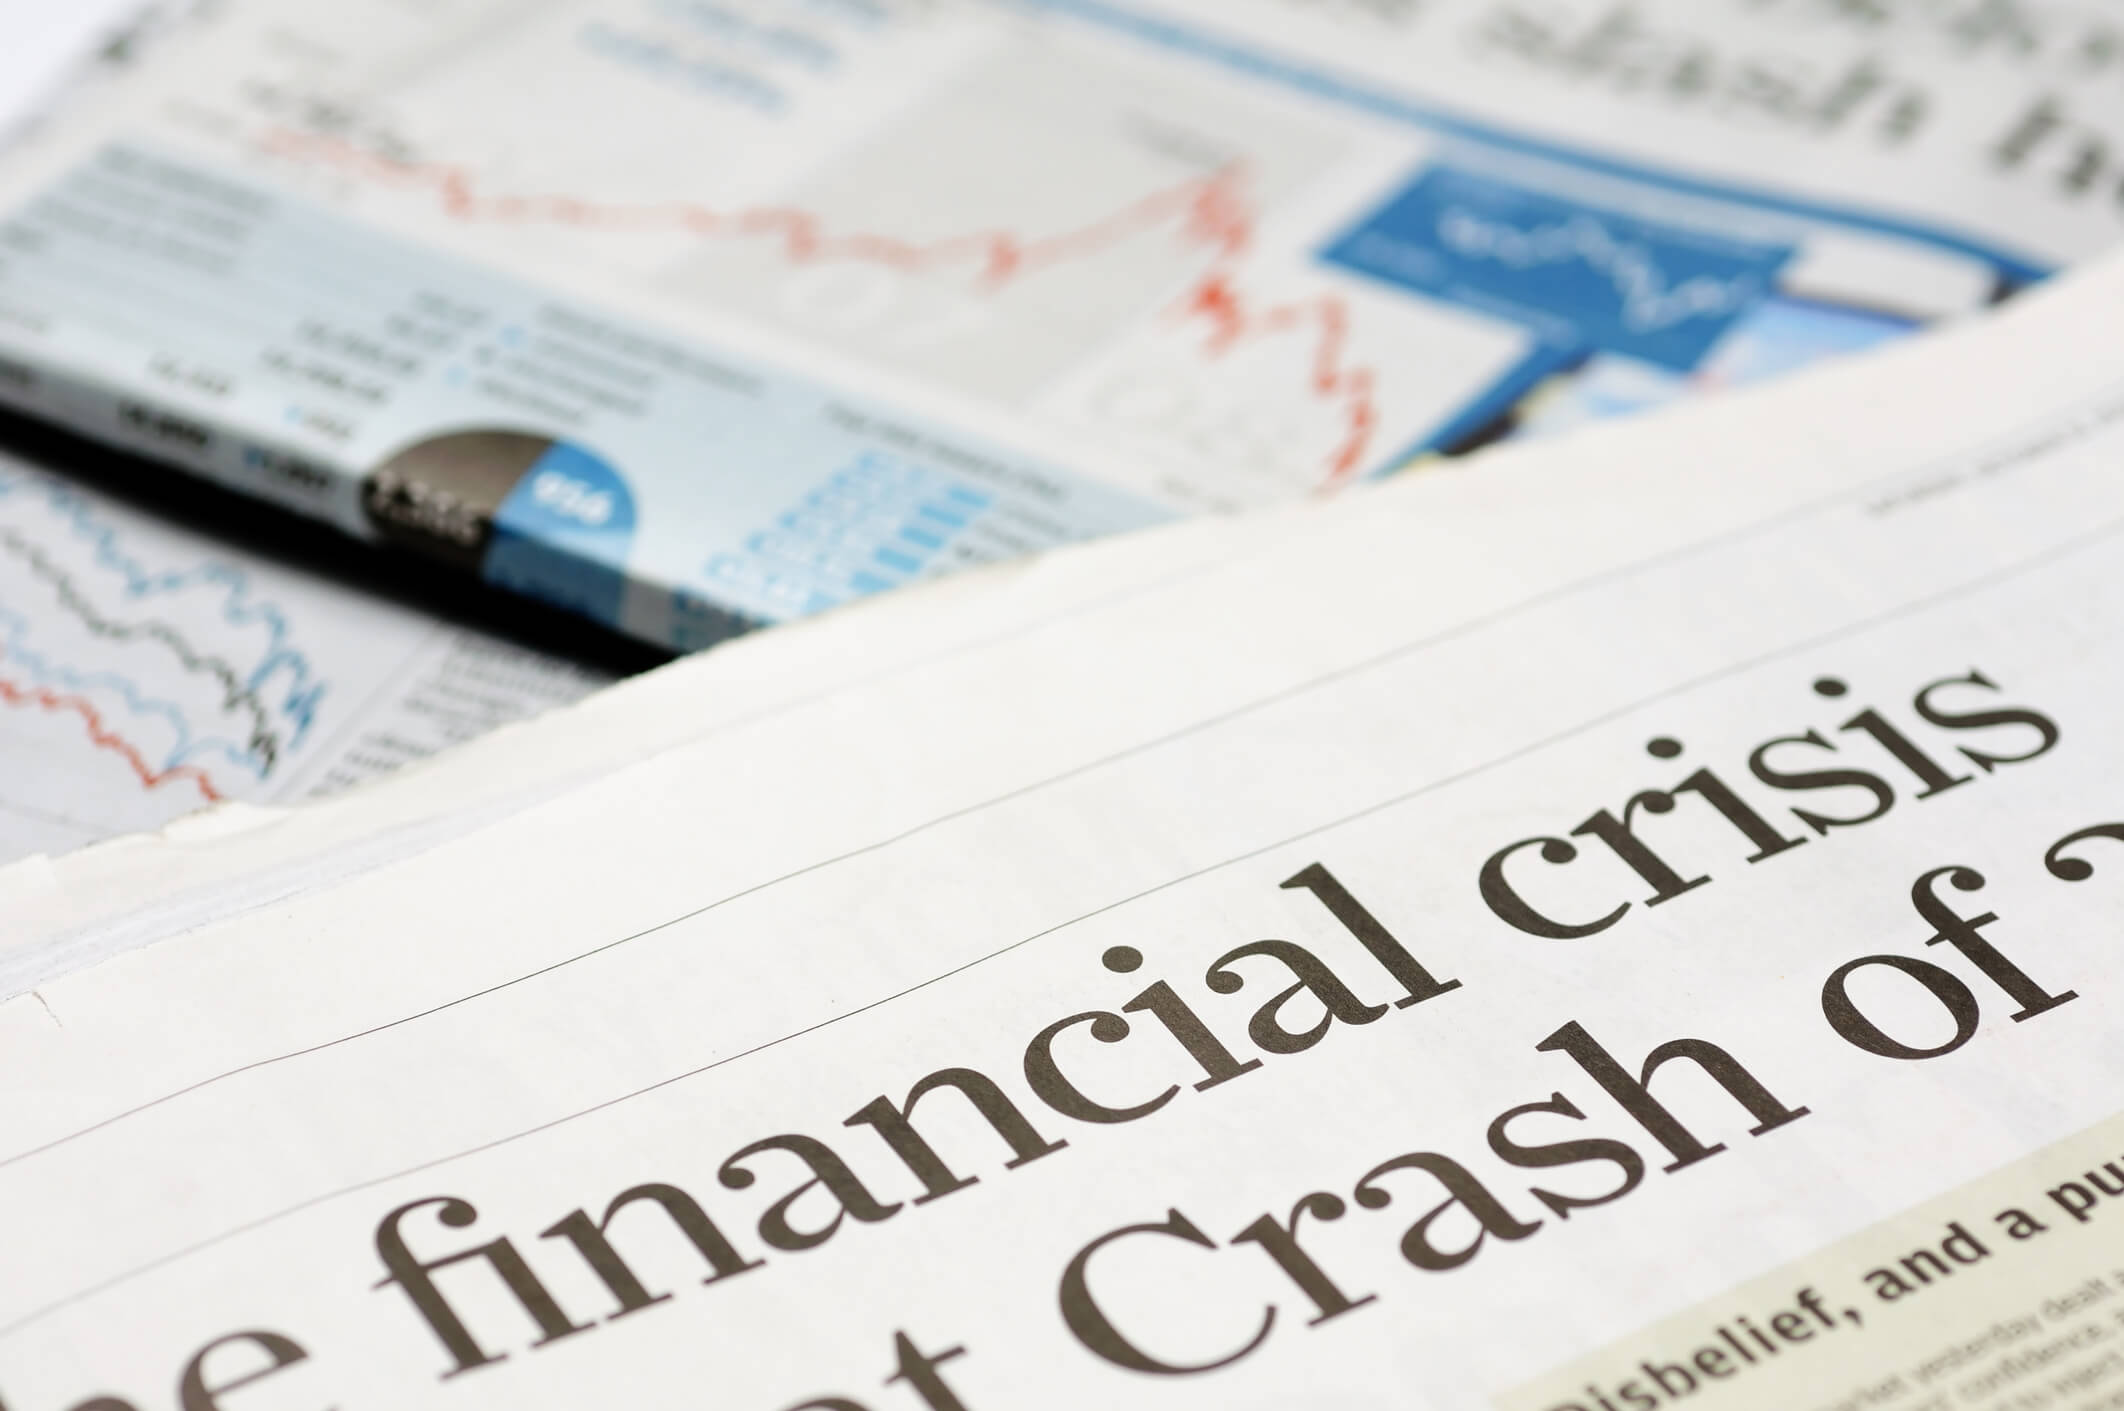 Financial Crisis - Complete Controller